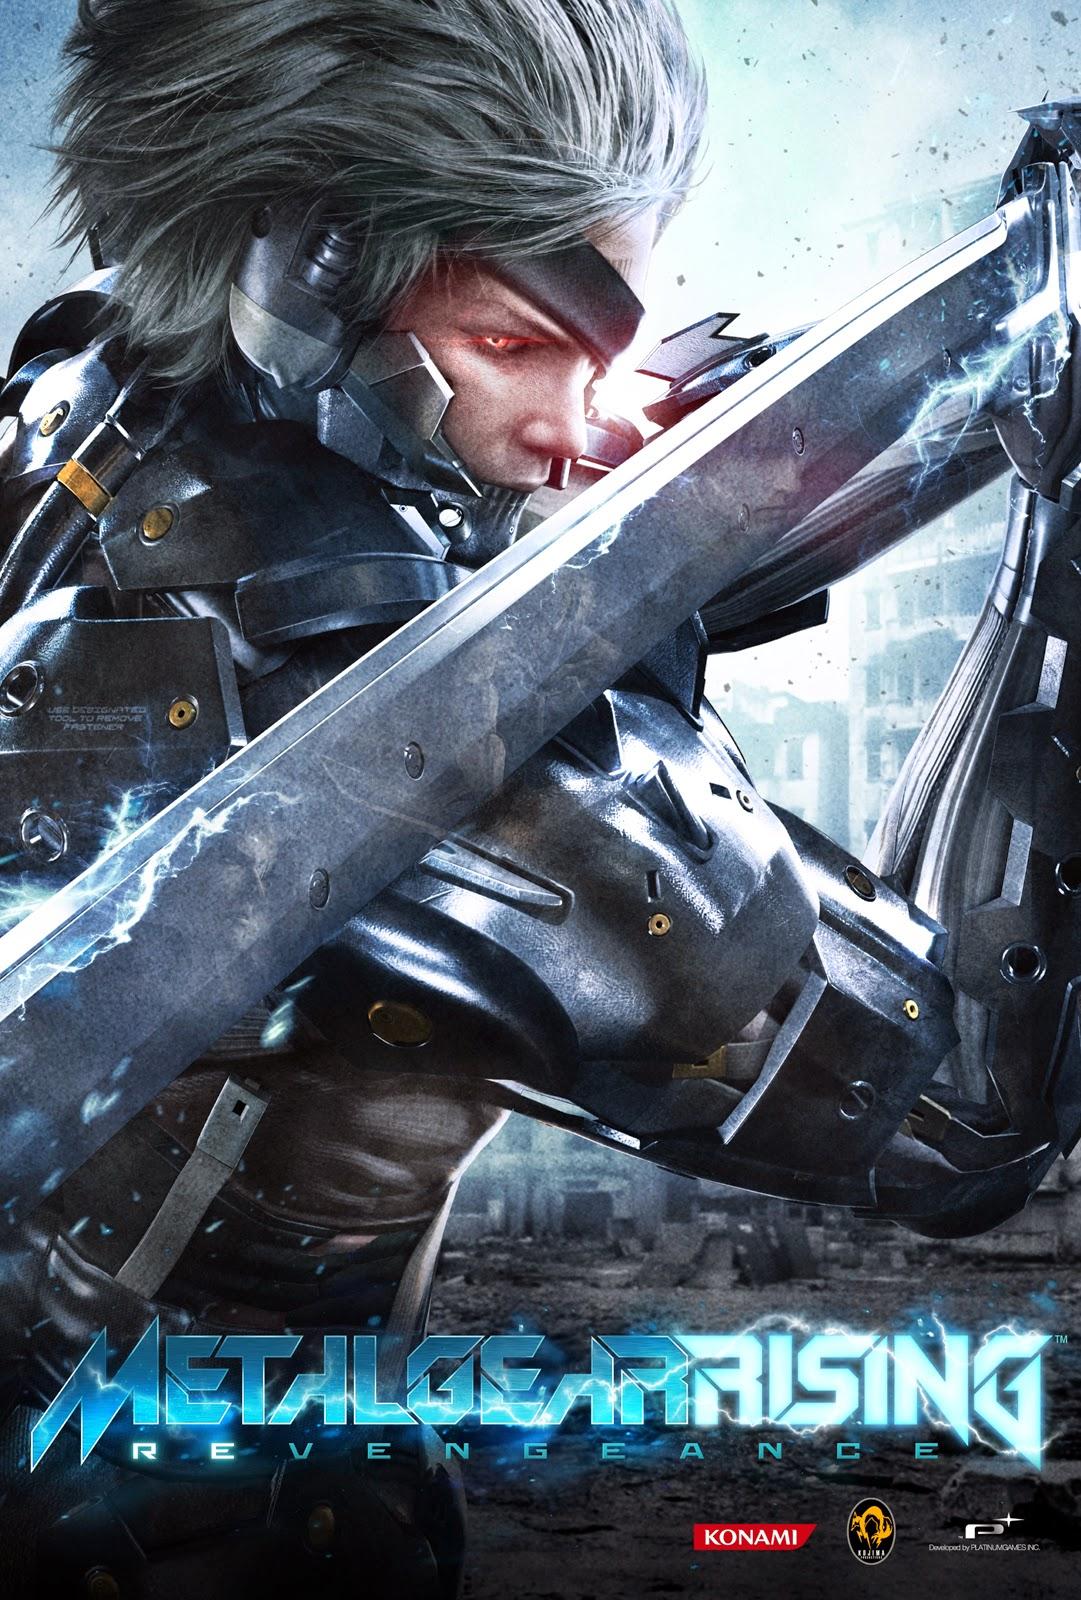 metal gear rising revengeance pc full free download